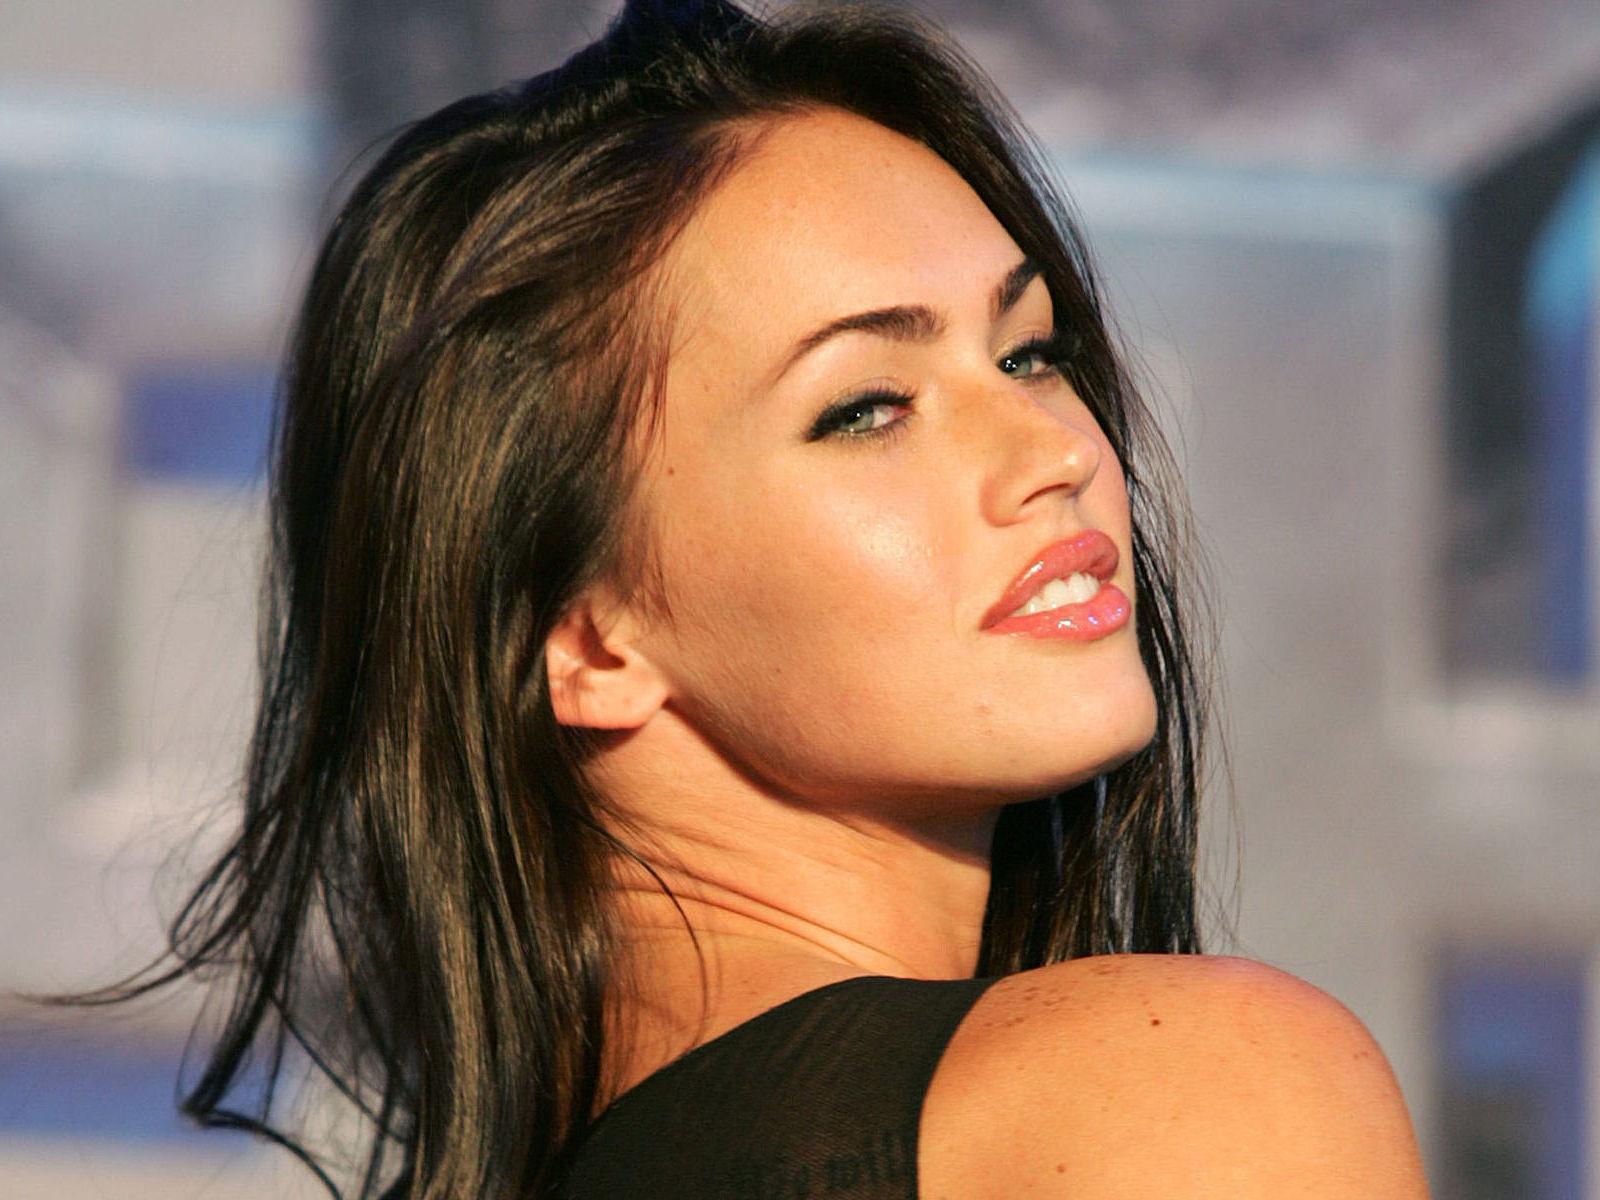 Megan Fox Wallpaper Hd To Make Transformers 5 Comeback Jpeg 126121